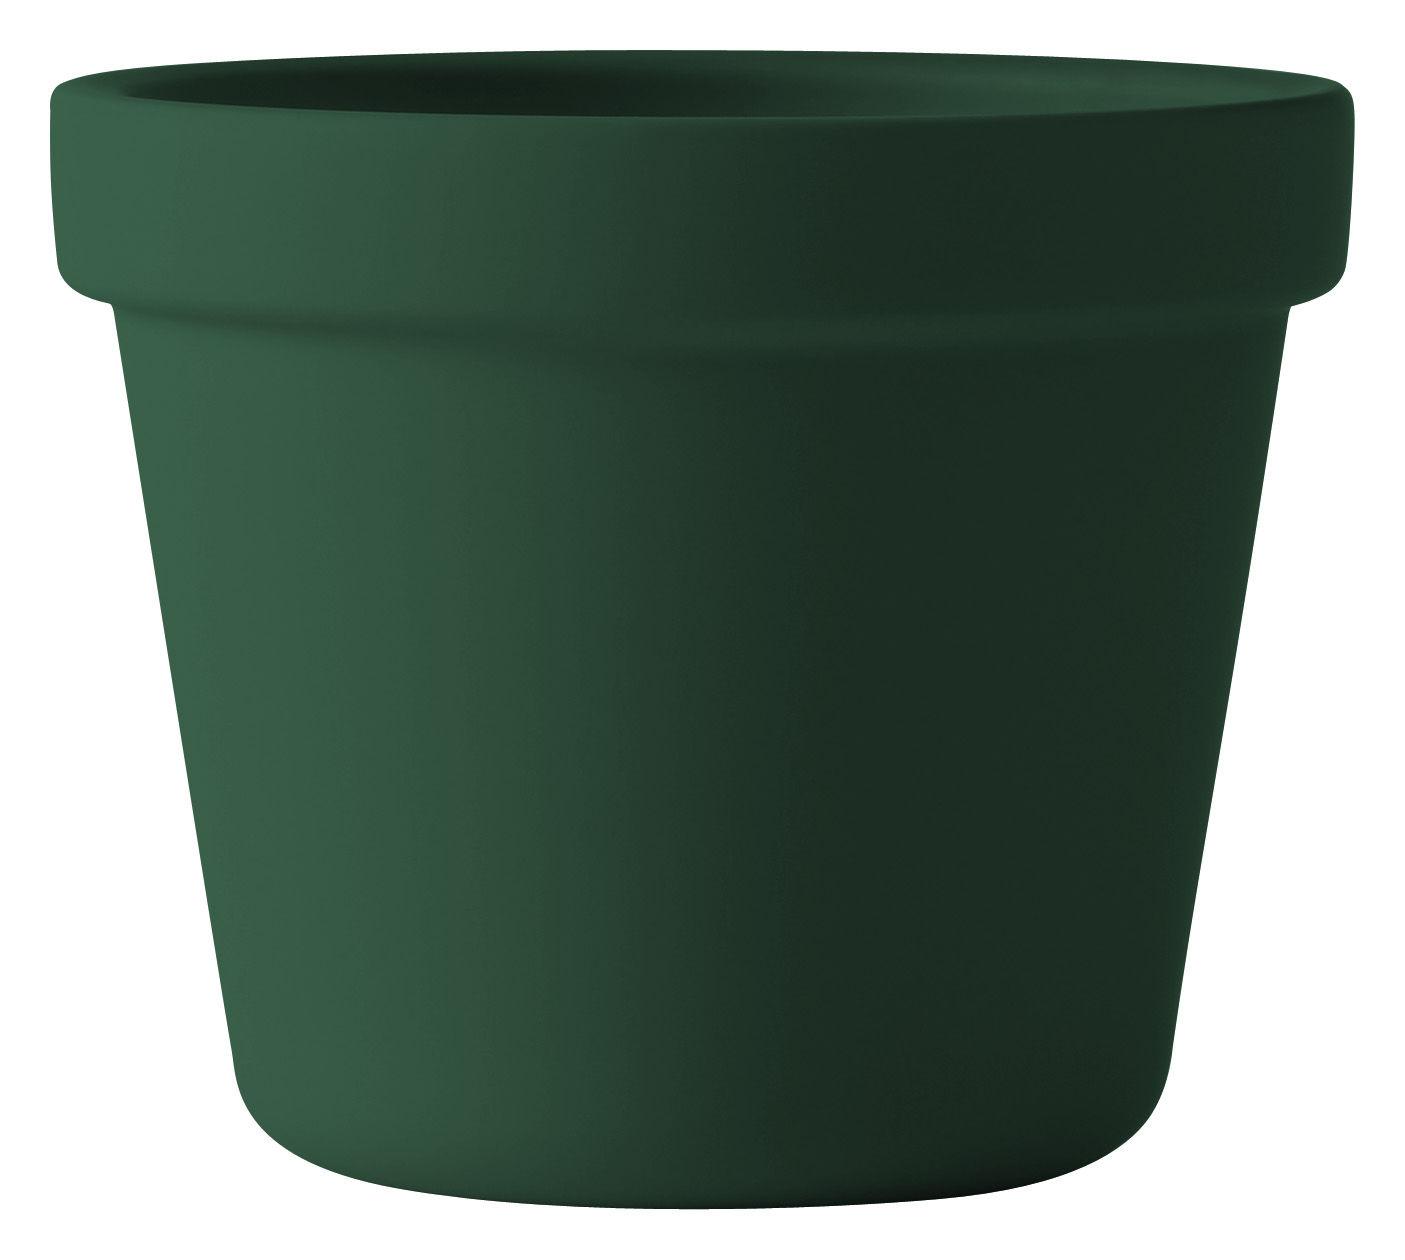 Pot De Fleurs Outside In Muuto Vert O 17 Cm H 14 6 X O 17